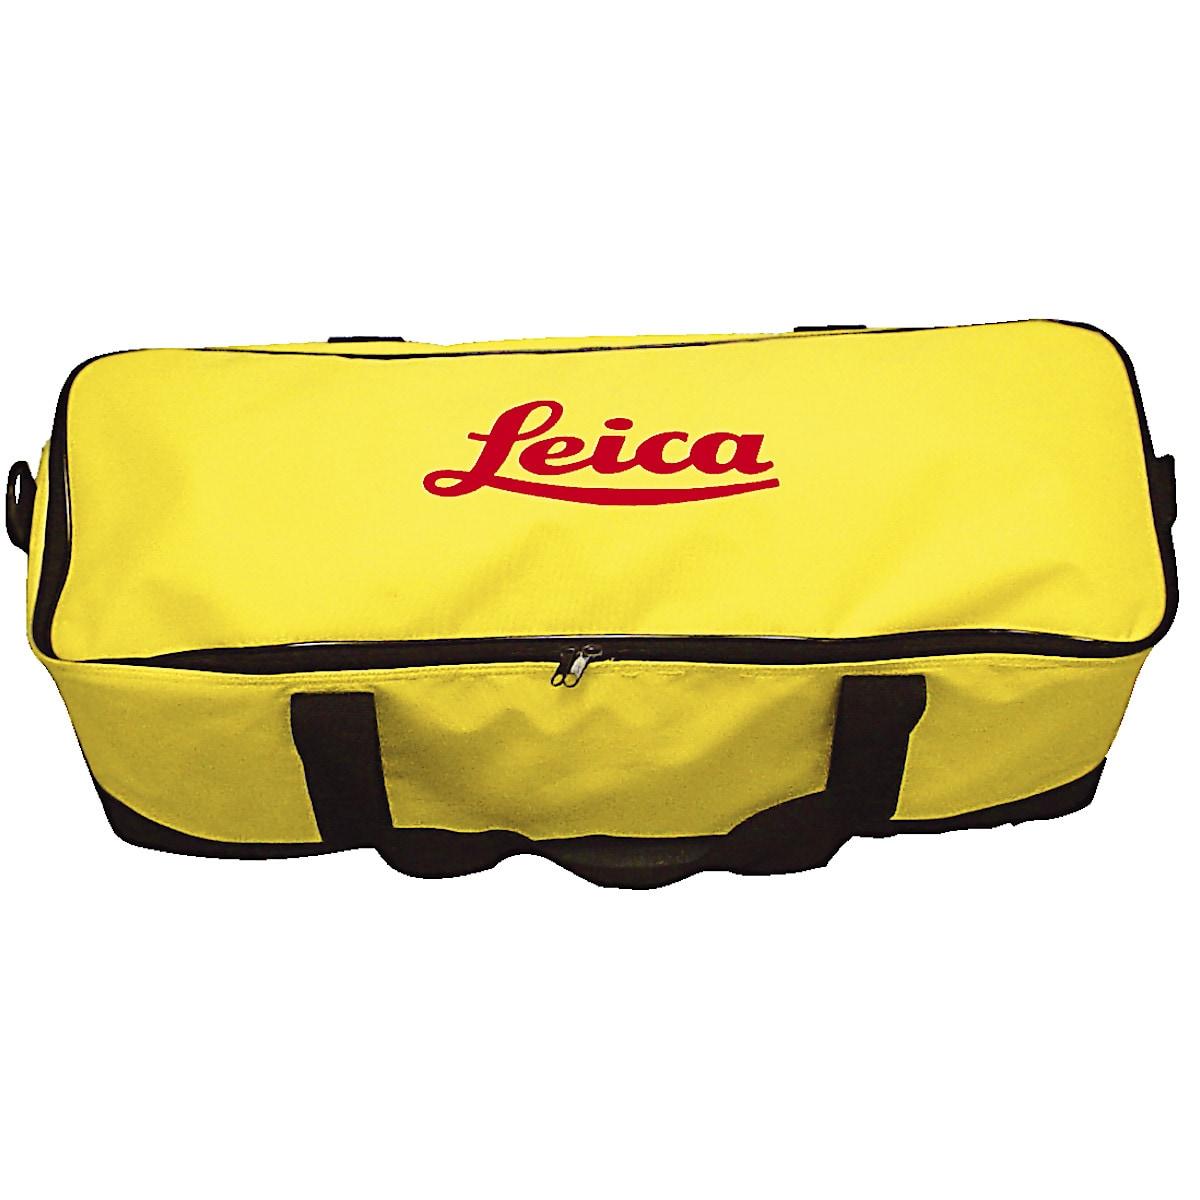 Väska Leica Digisystem